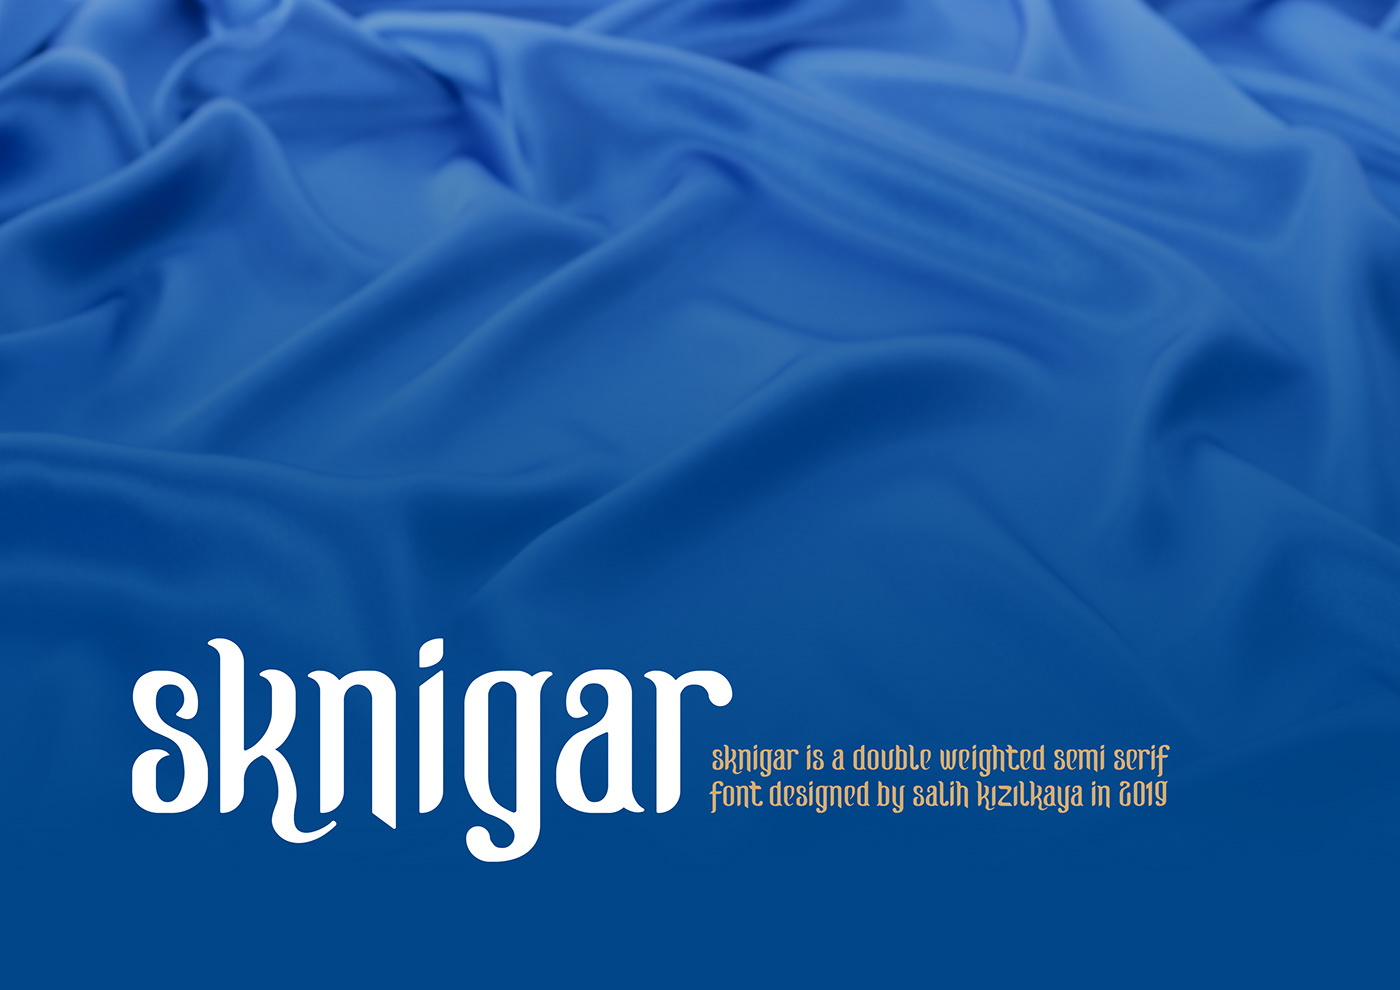 Image may contain: screenshot, electric blue and aqua